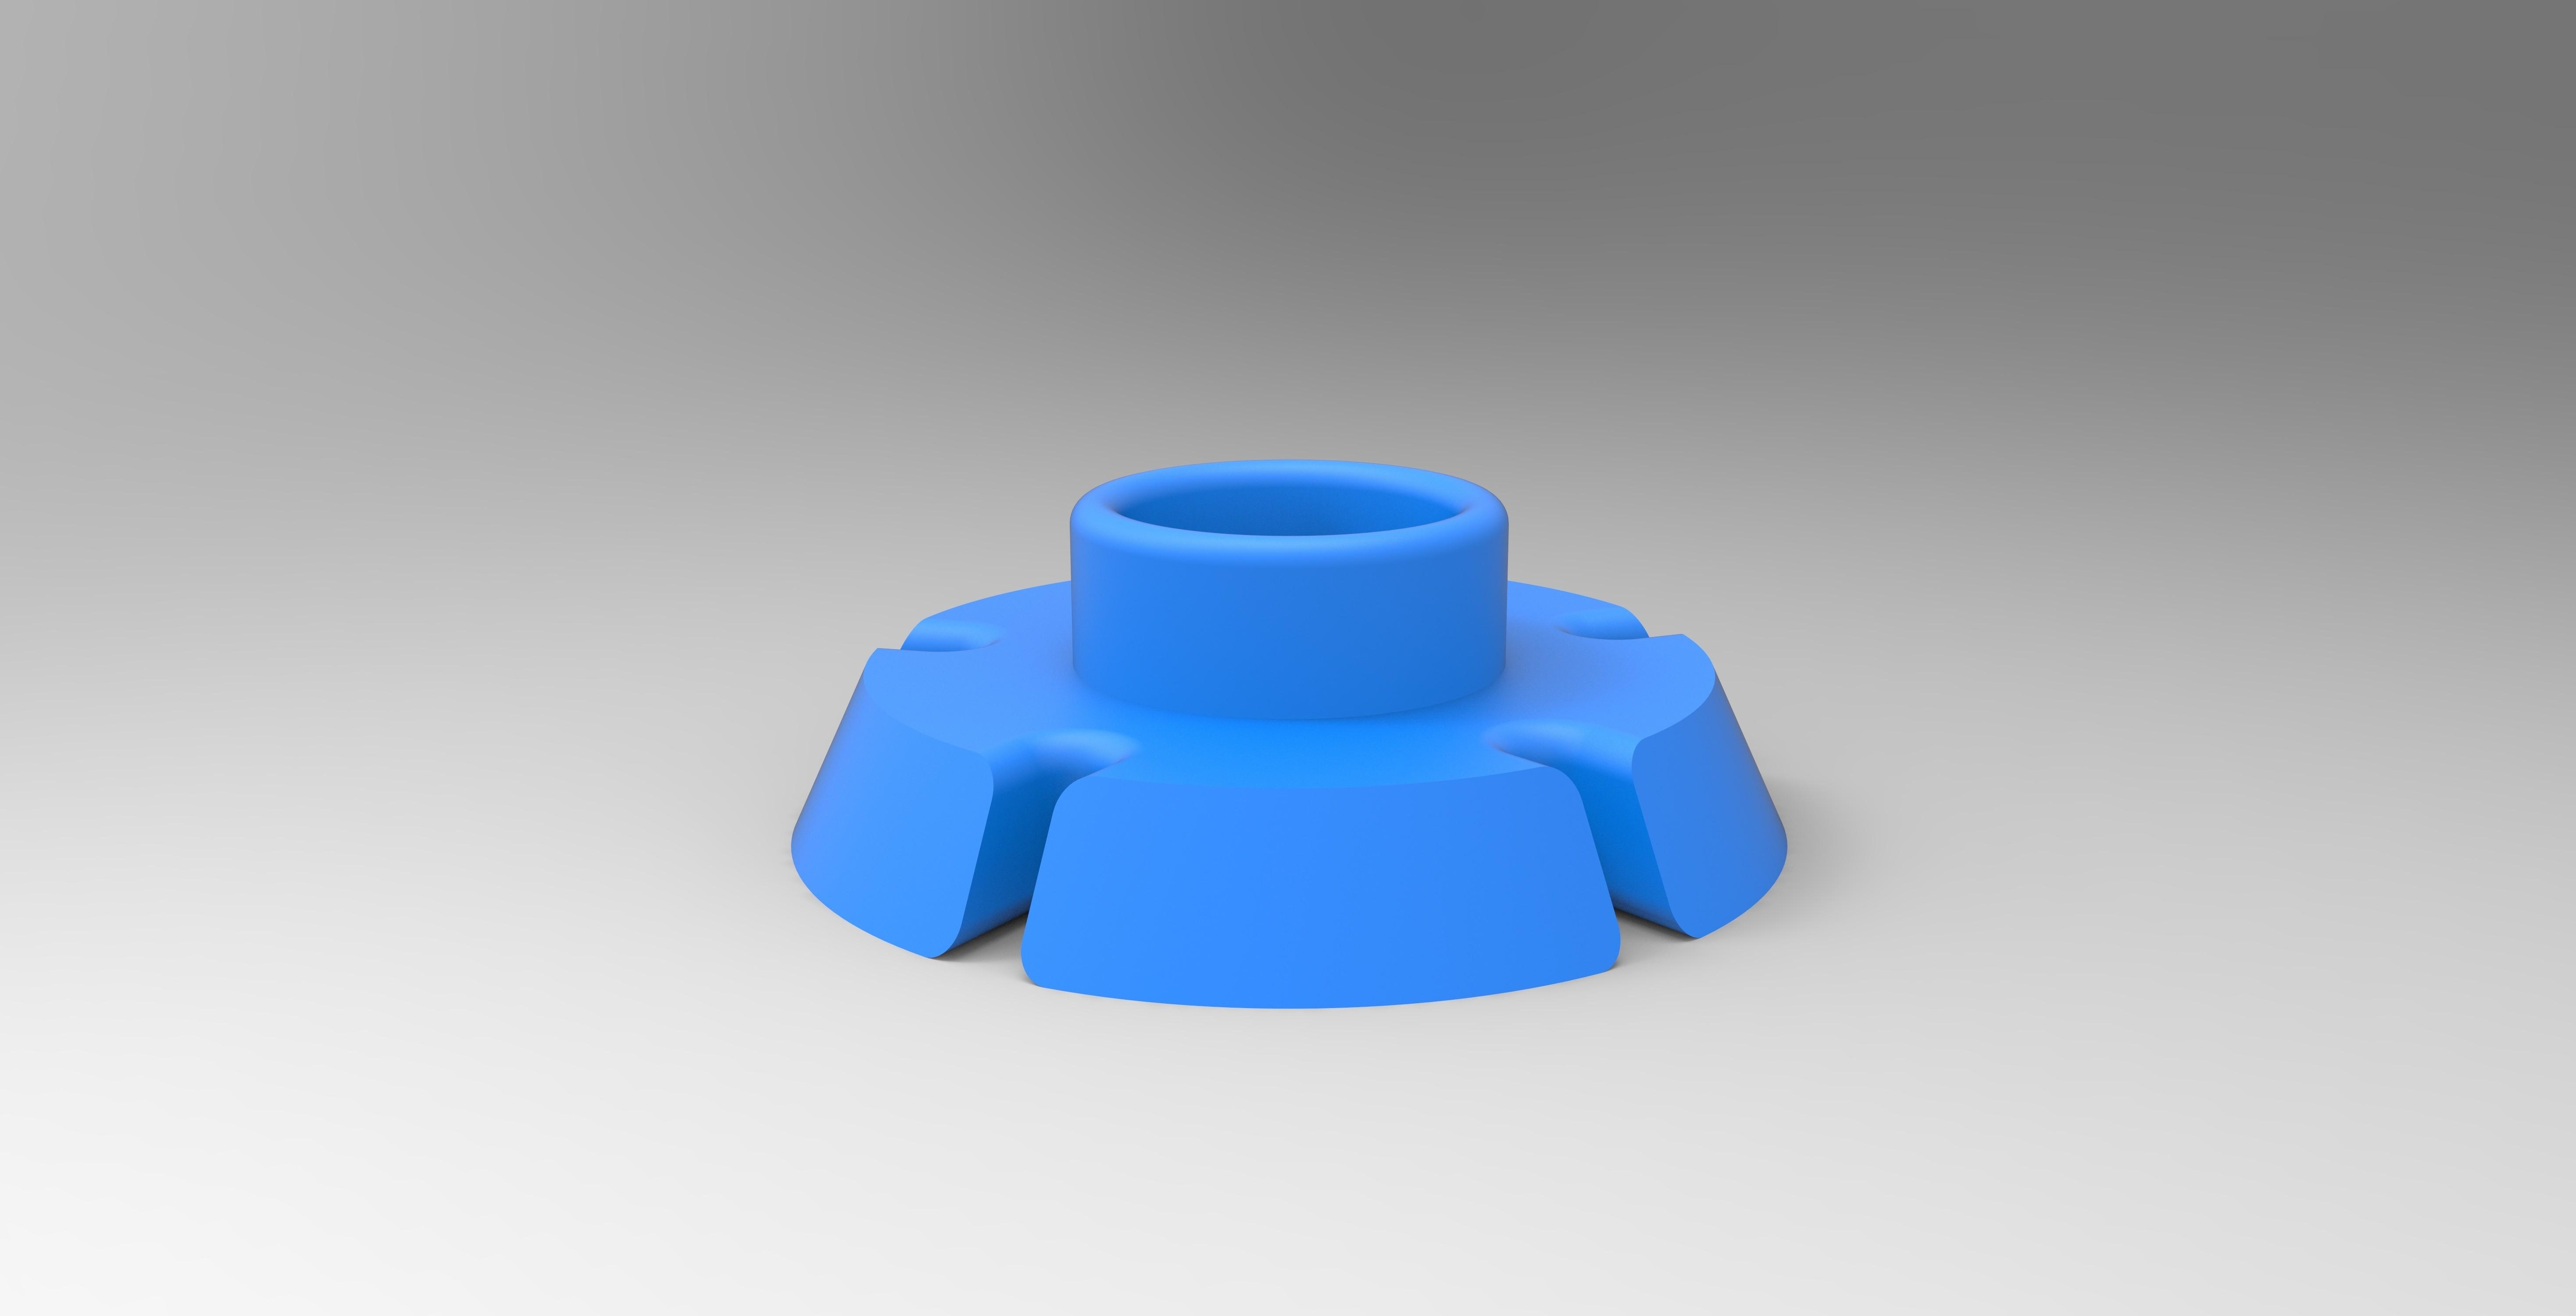 f.jpg Download STL file HELP CUTTING CAKE PART CUTTING • 3D printer object, GuilhemPerroud